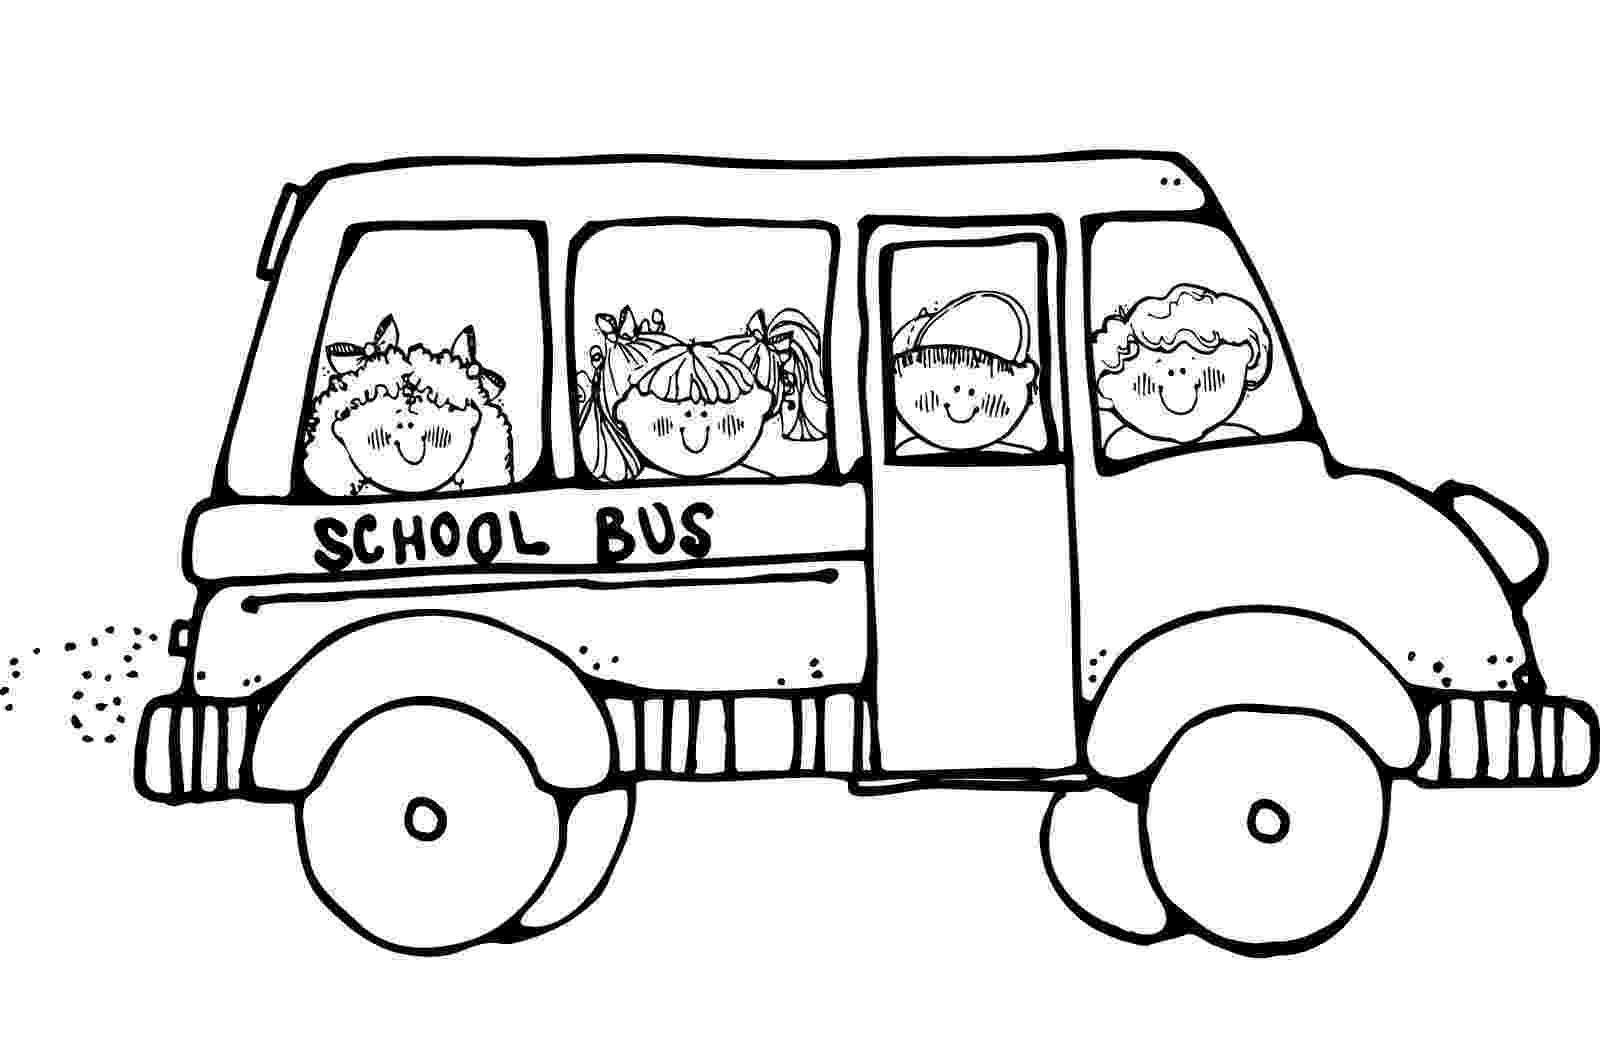 school bus coloring sheet free printable school bus coloring pages for kids sheet bus coloring school